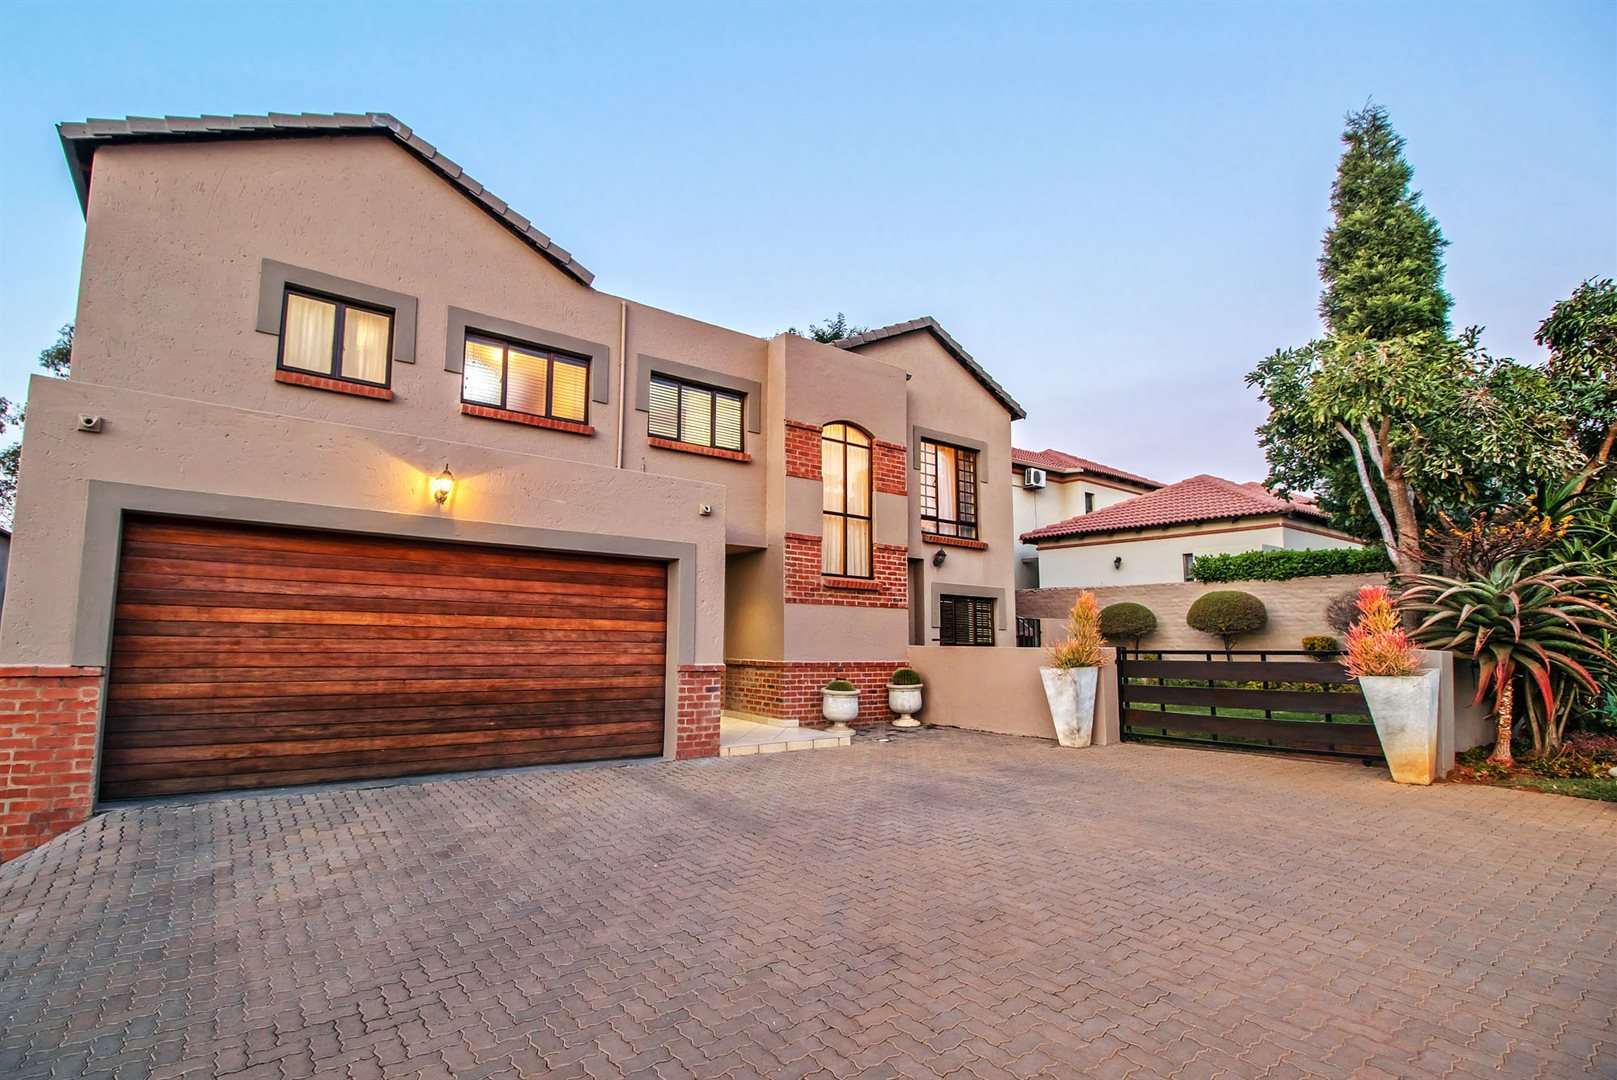 , House, 3 Bedrooms - ZAR 2,795,000